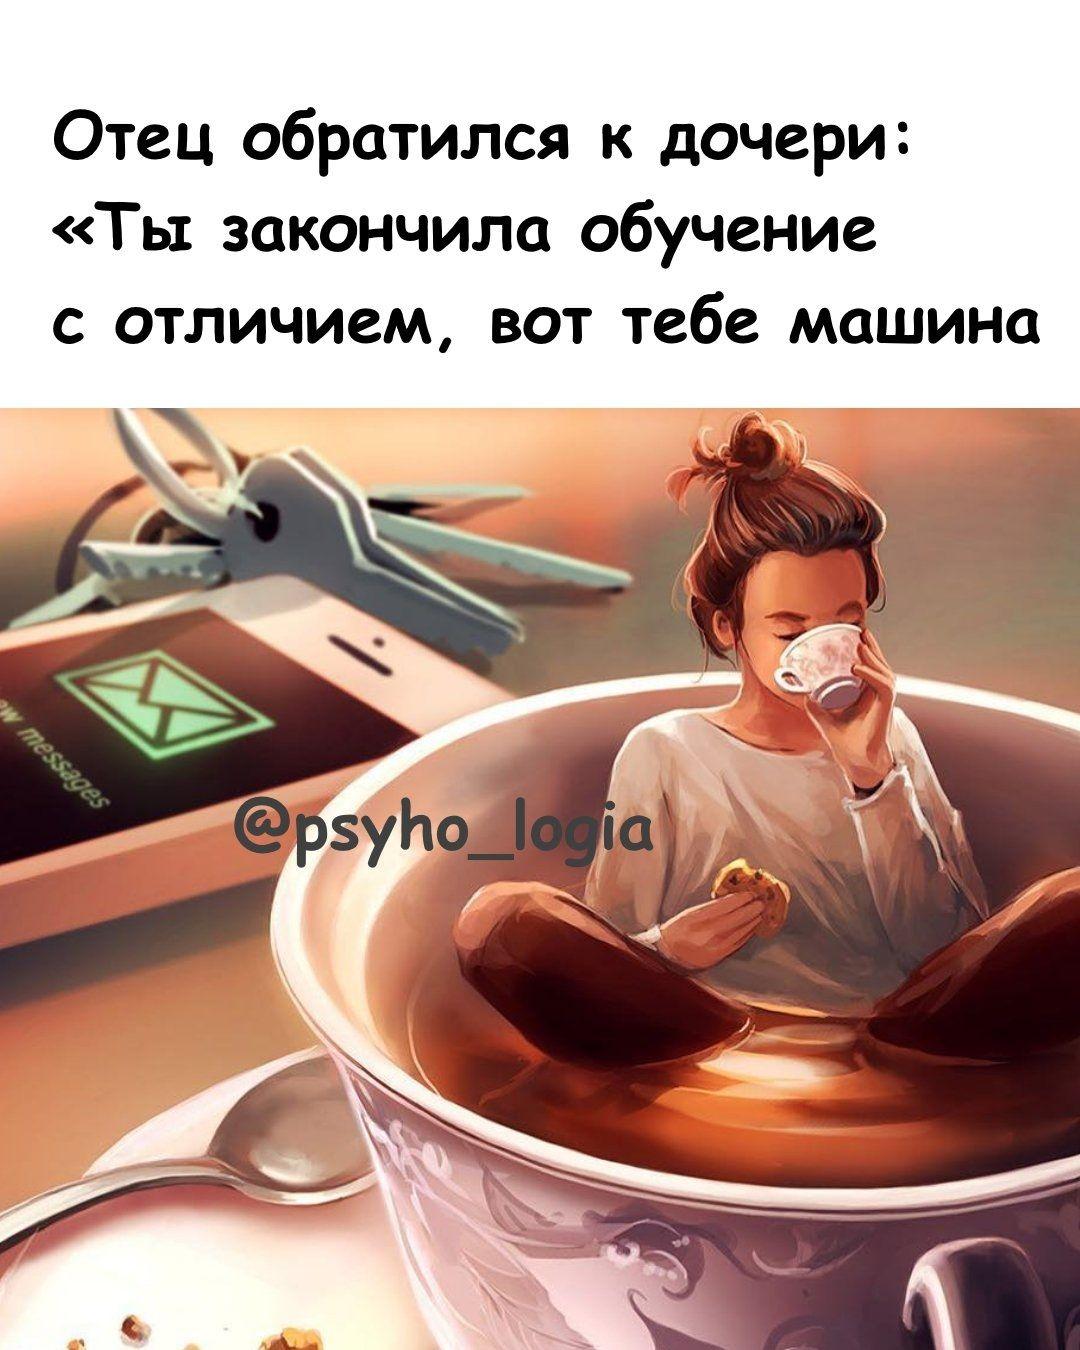 Instagram post by Психология Отношений • Jun 25, 2021 at 10:15am UTC